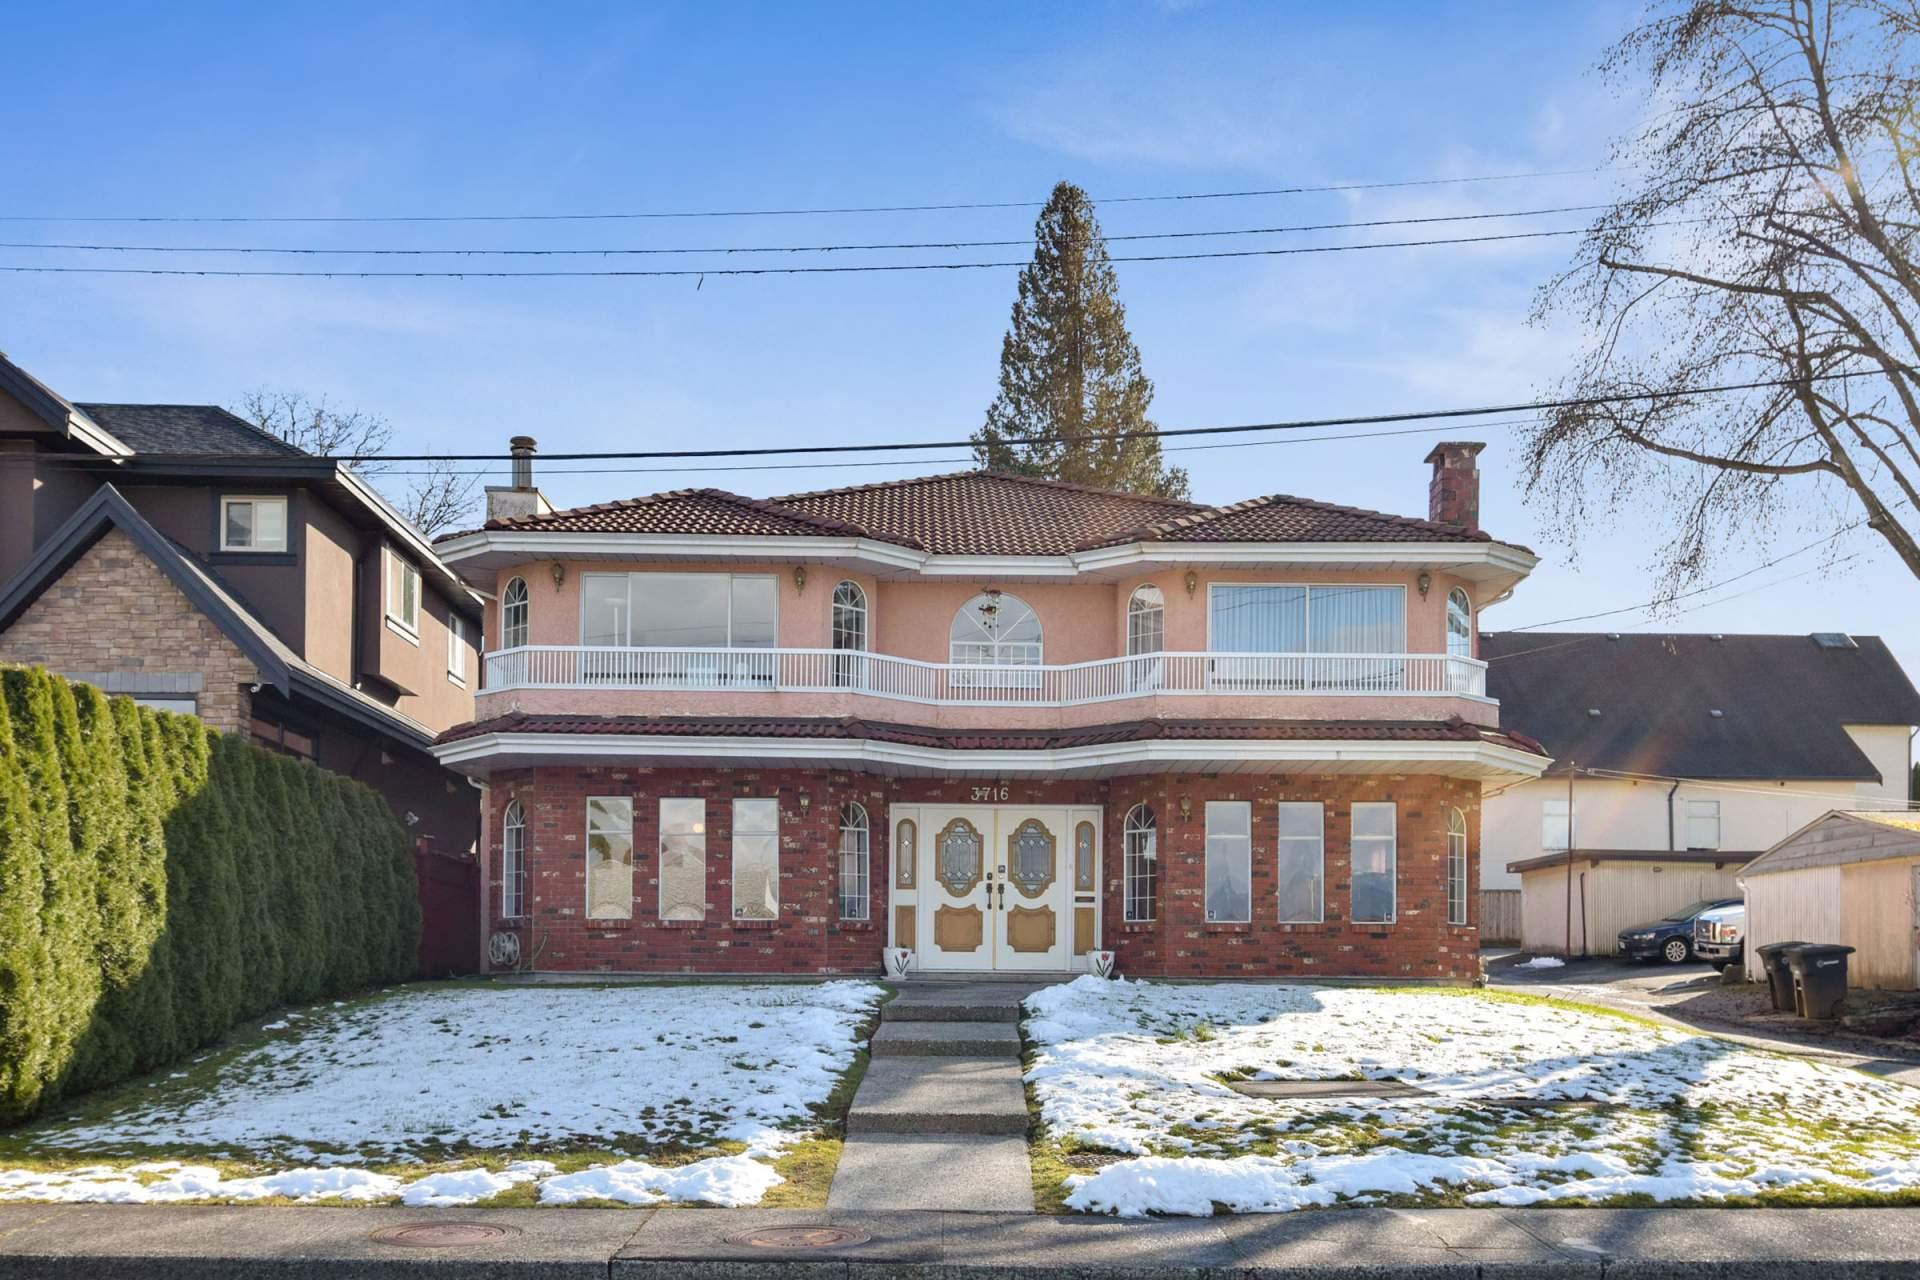 House for Sale 3716 Warren St